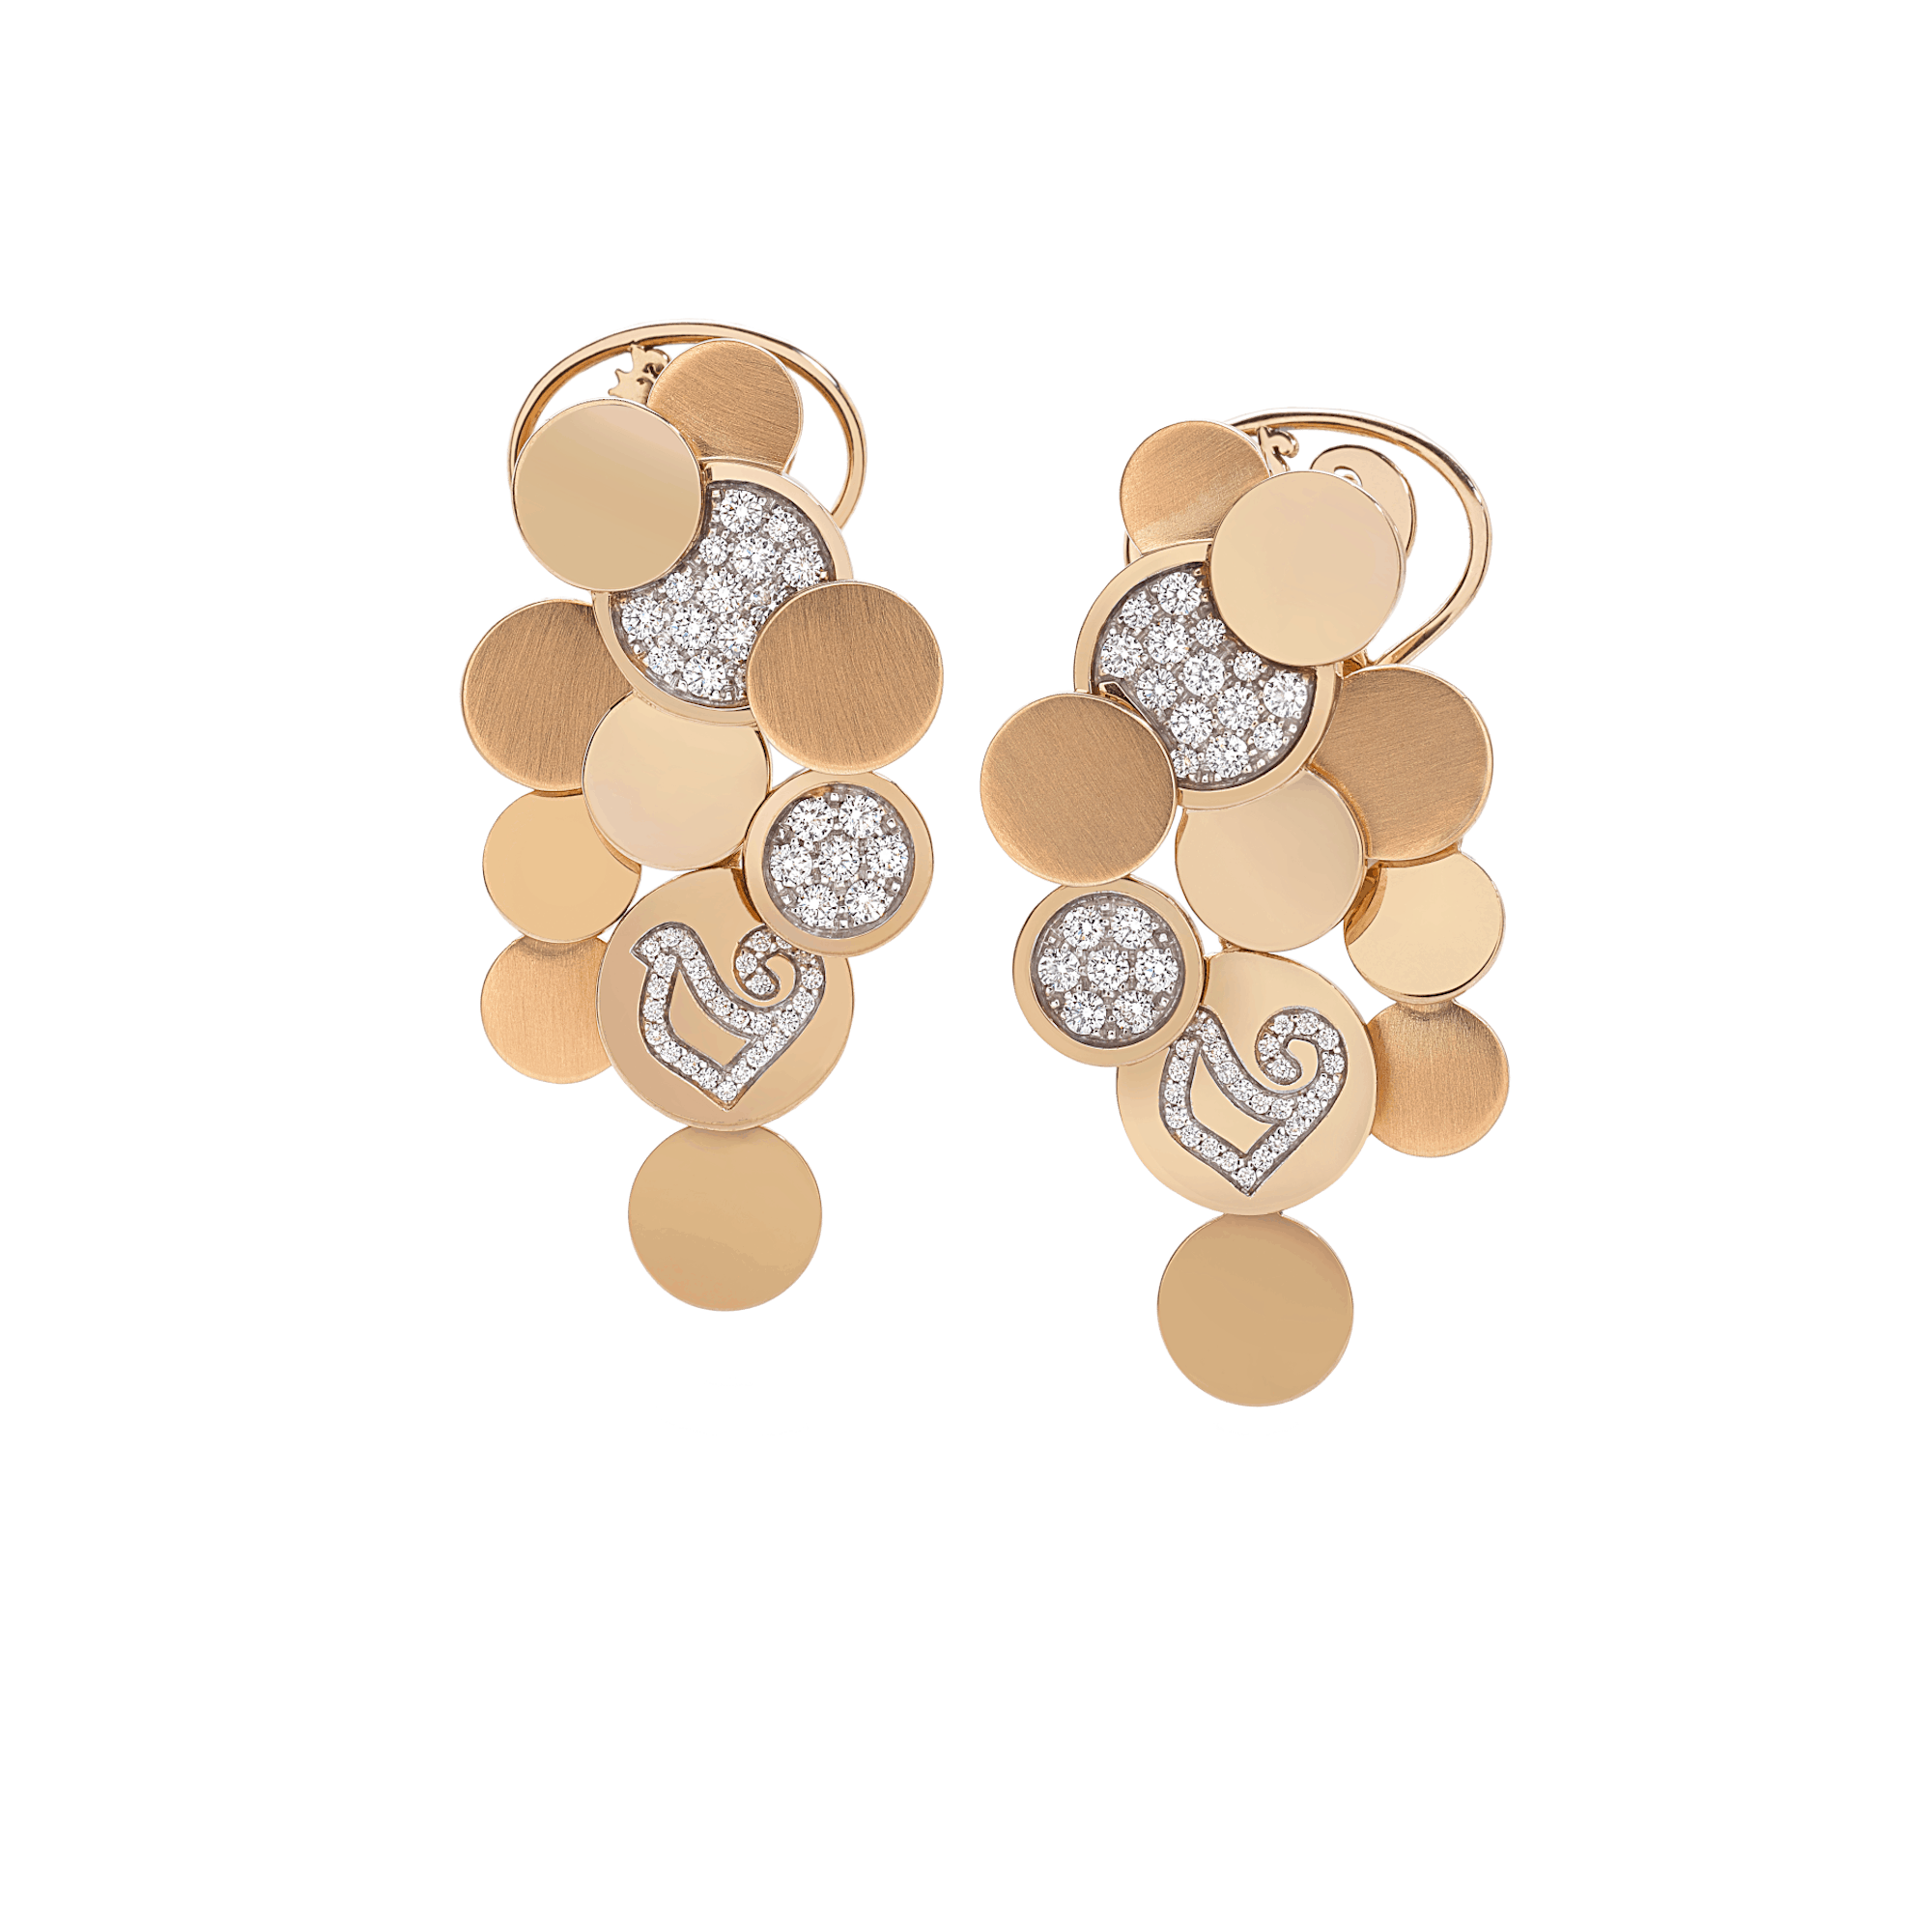 Chantecler Orecchini Paillettes oro rosa diamanti